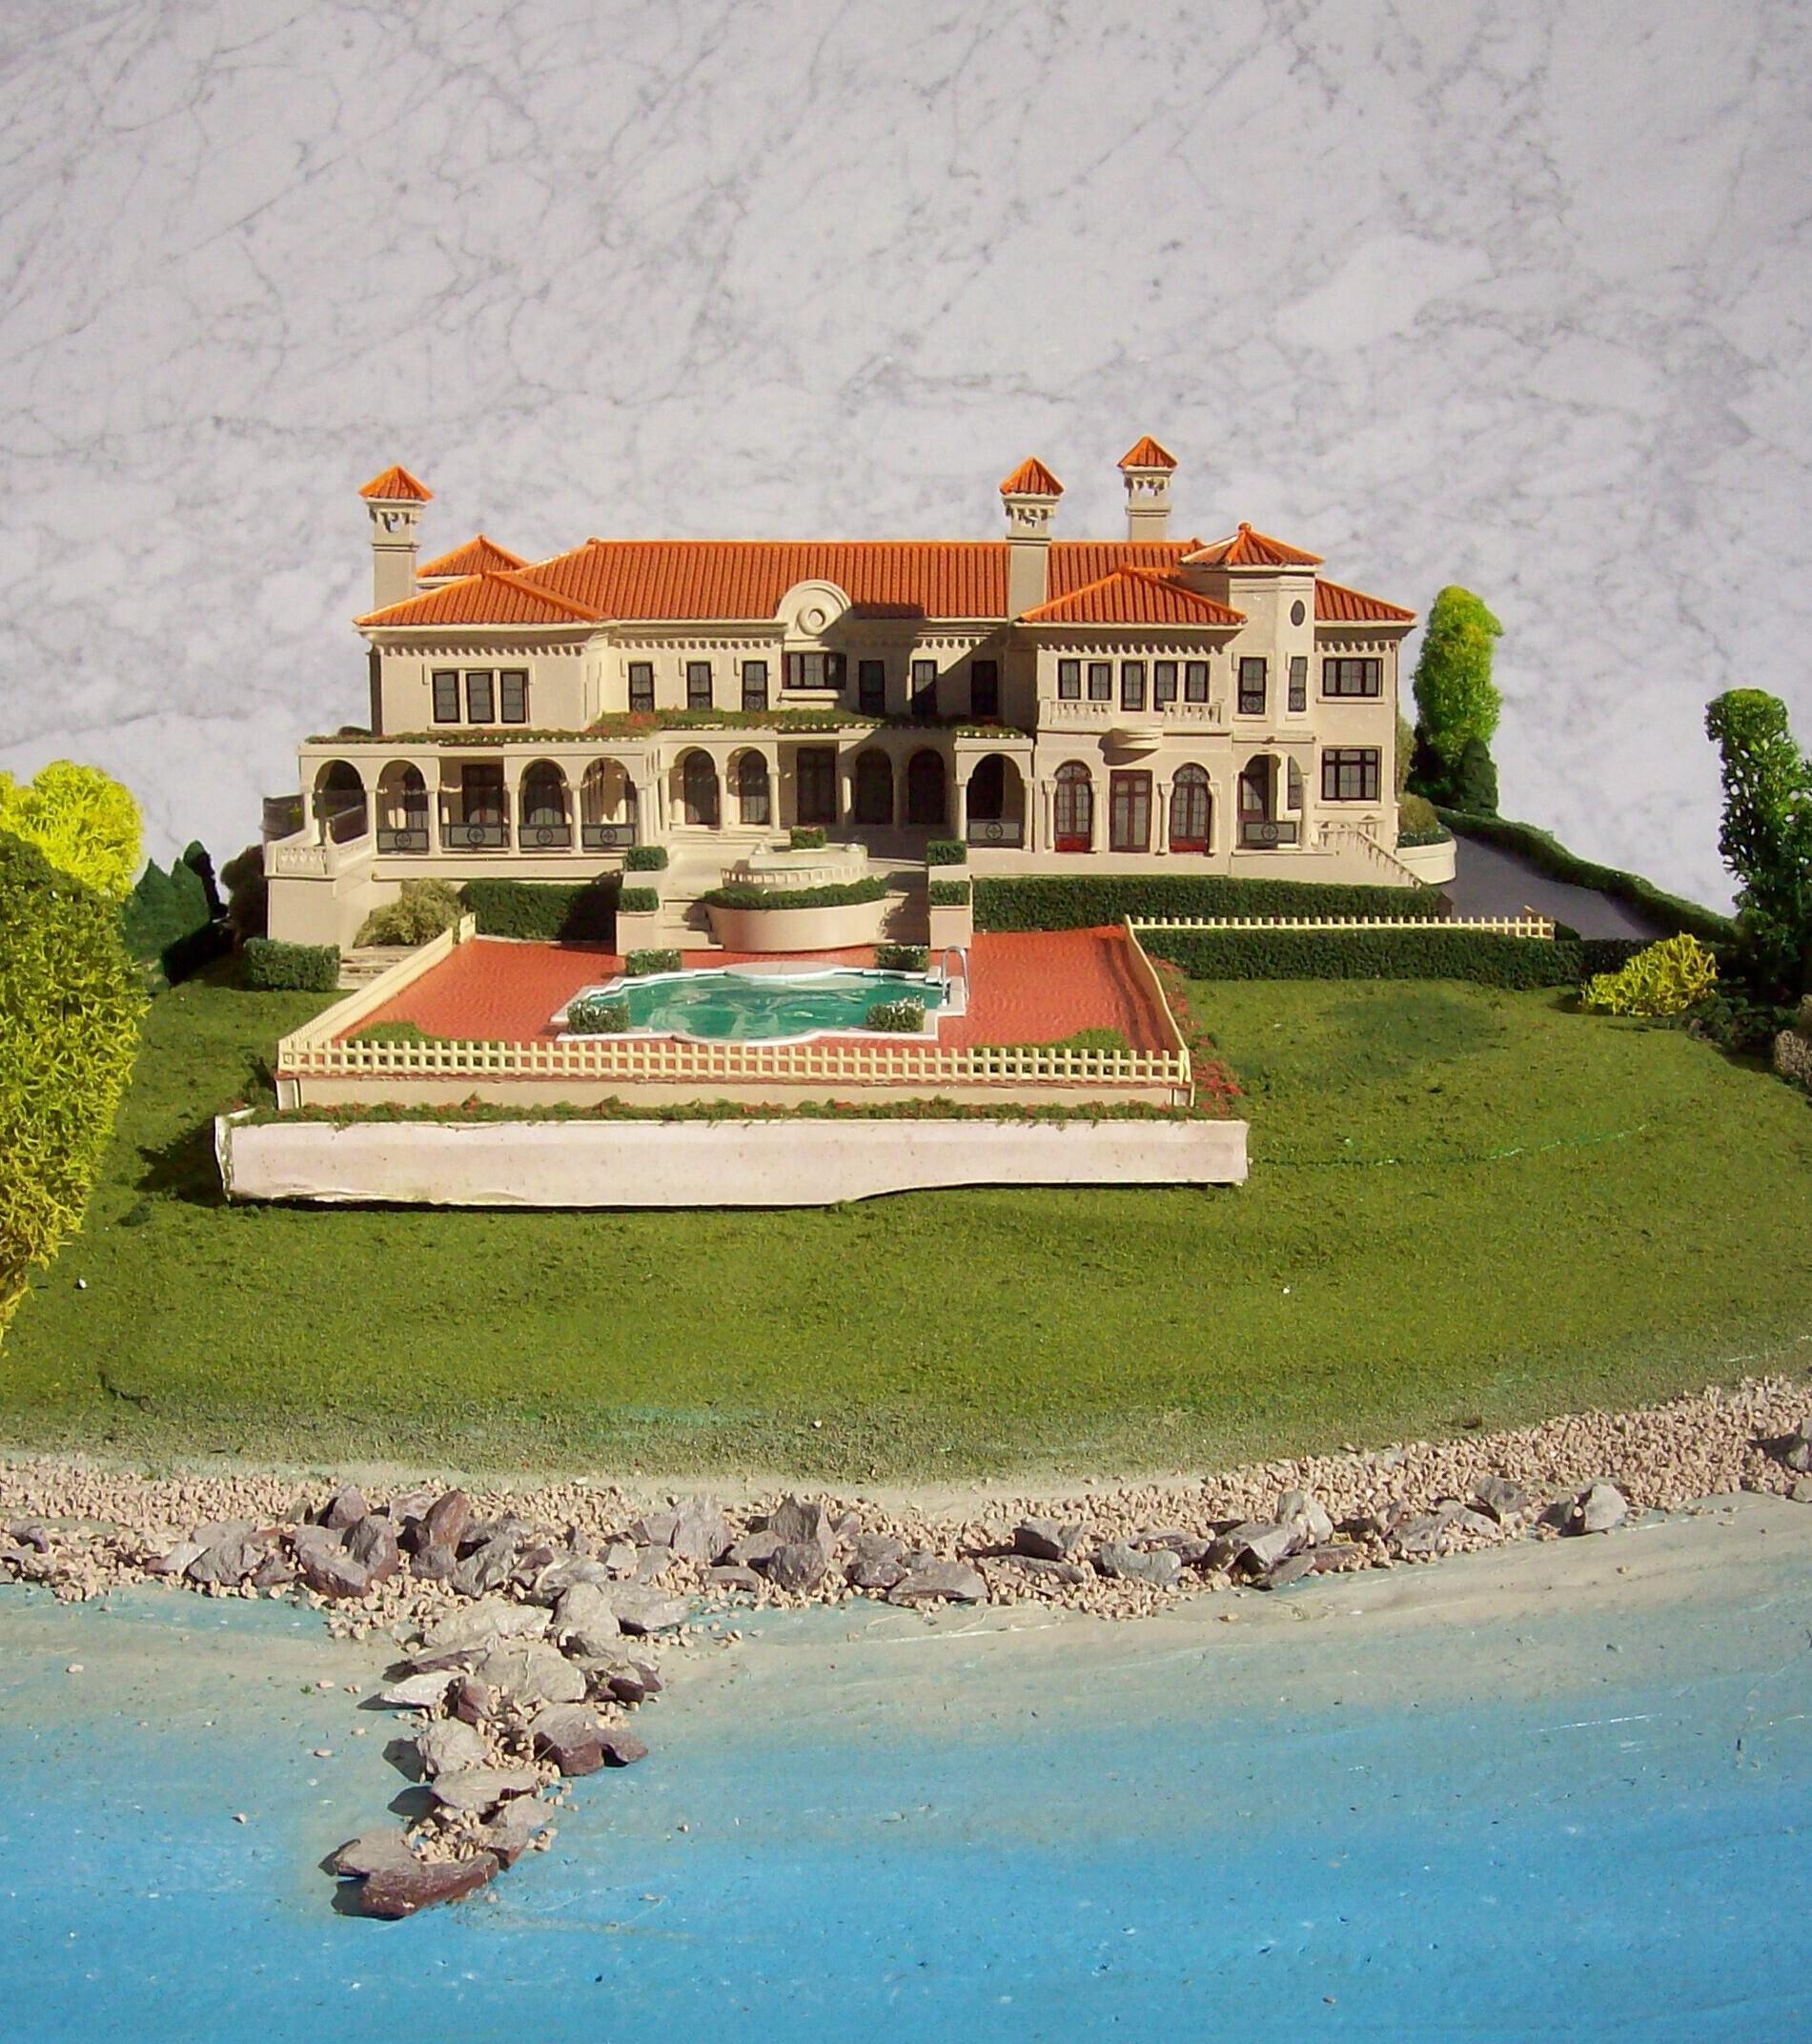 Model of a newly designed estate on Gold Coast of Long Island